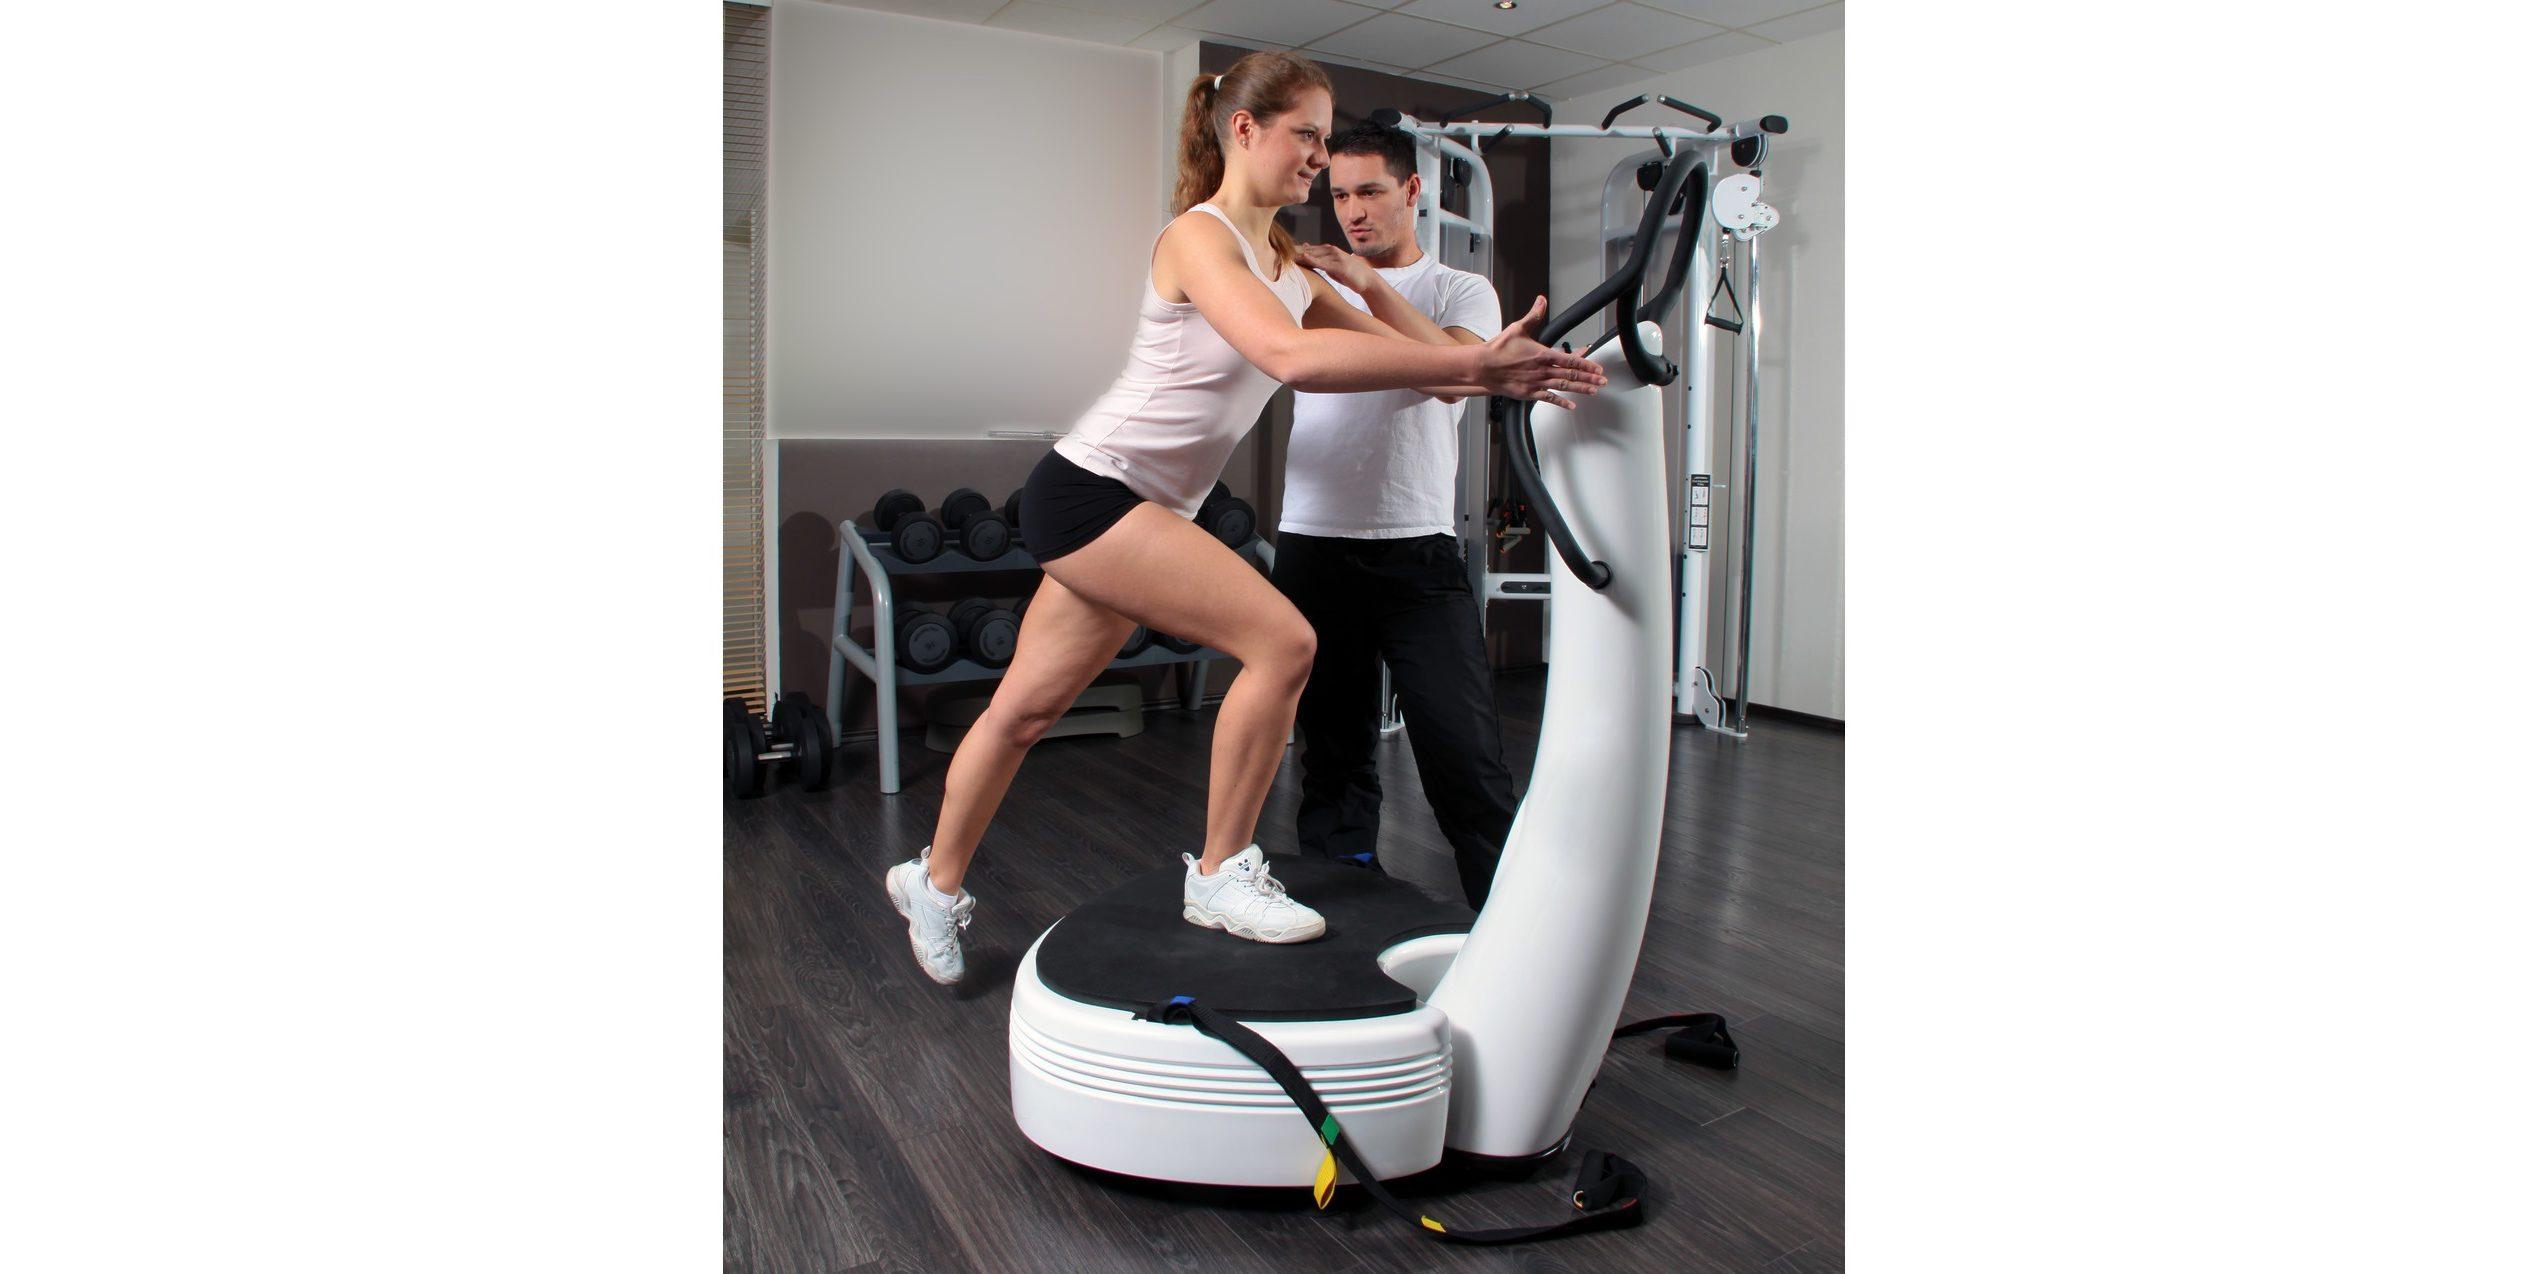 Akute neuromuskuläre Modulation steigert die posturale Kontrolle nach Ganzkörpervibration